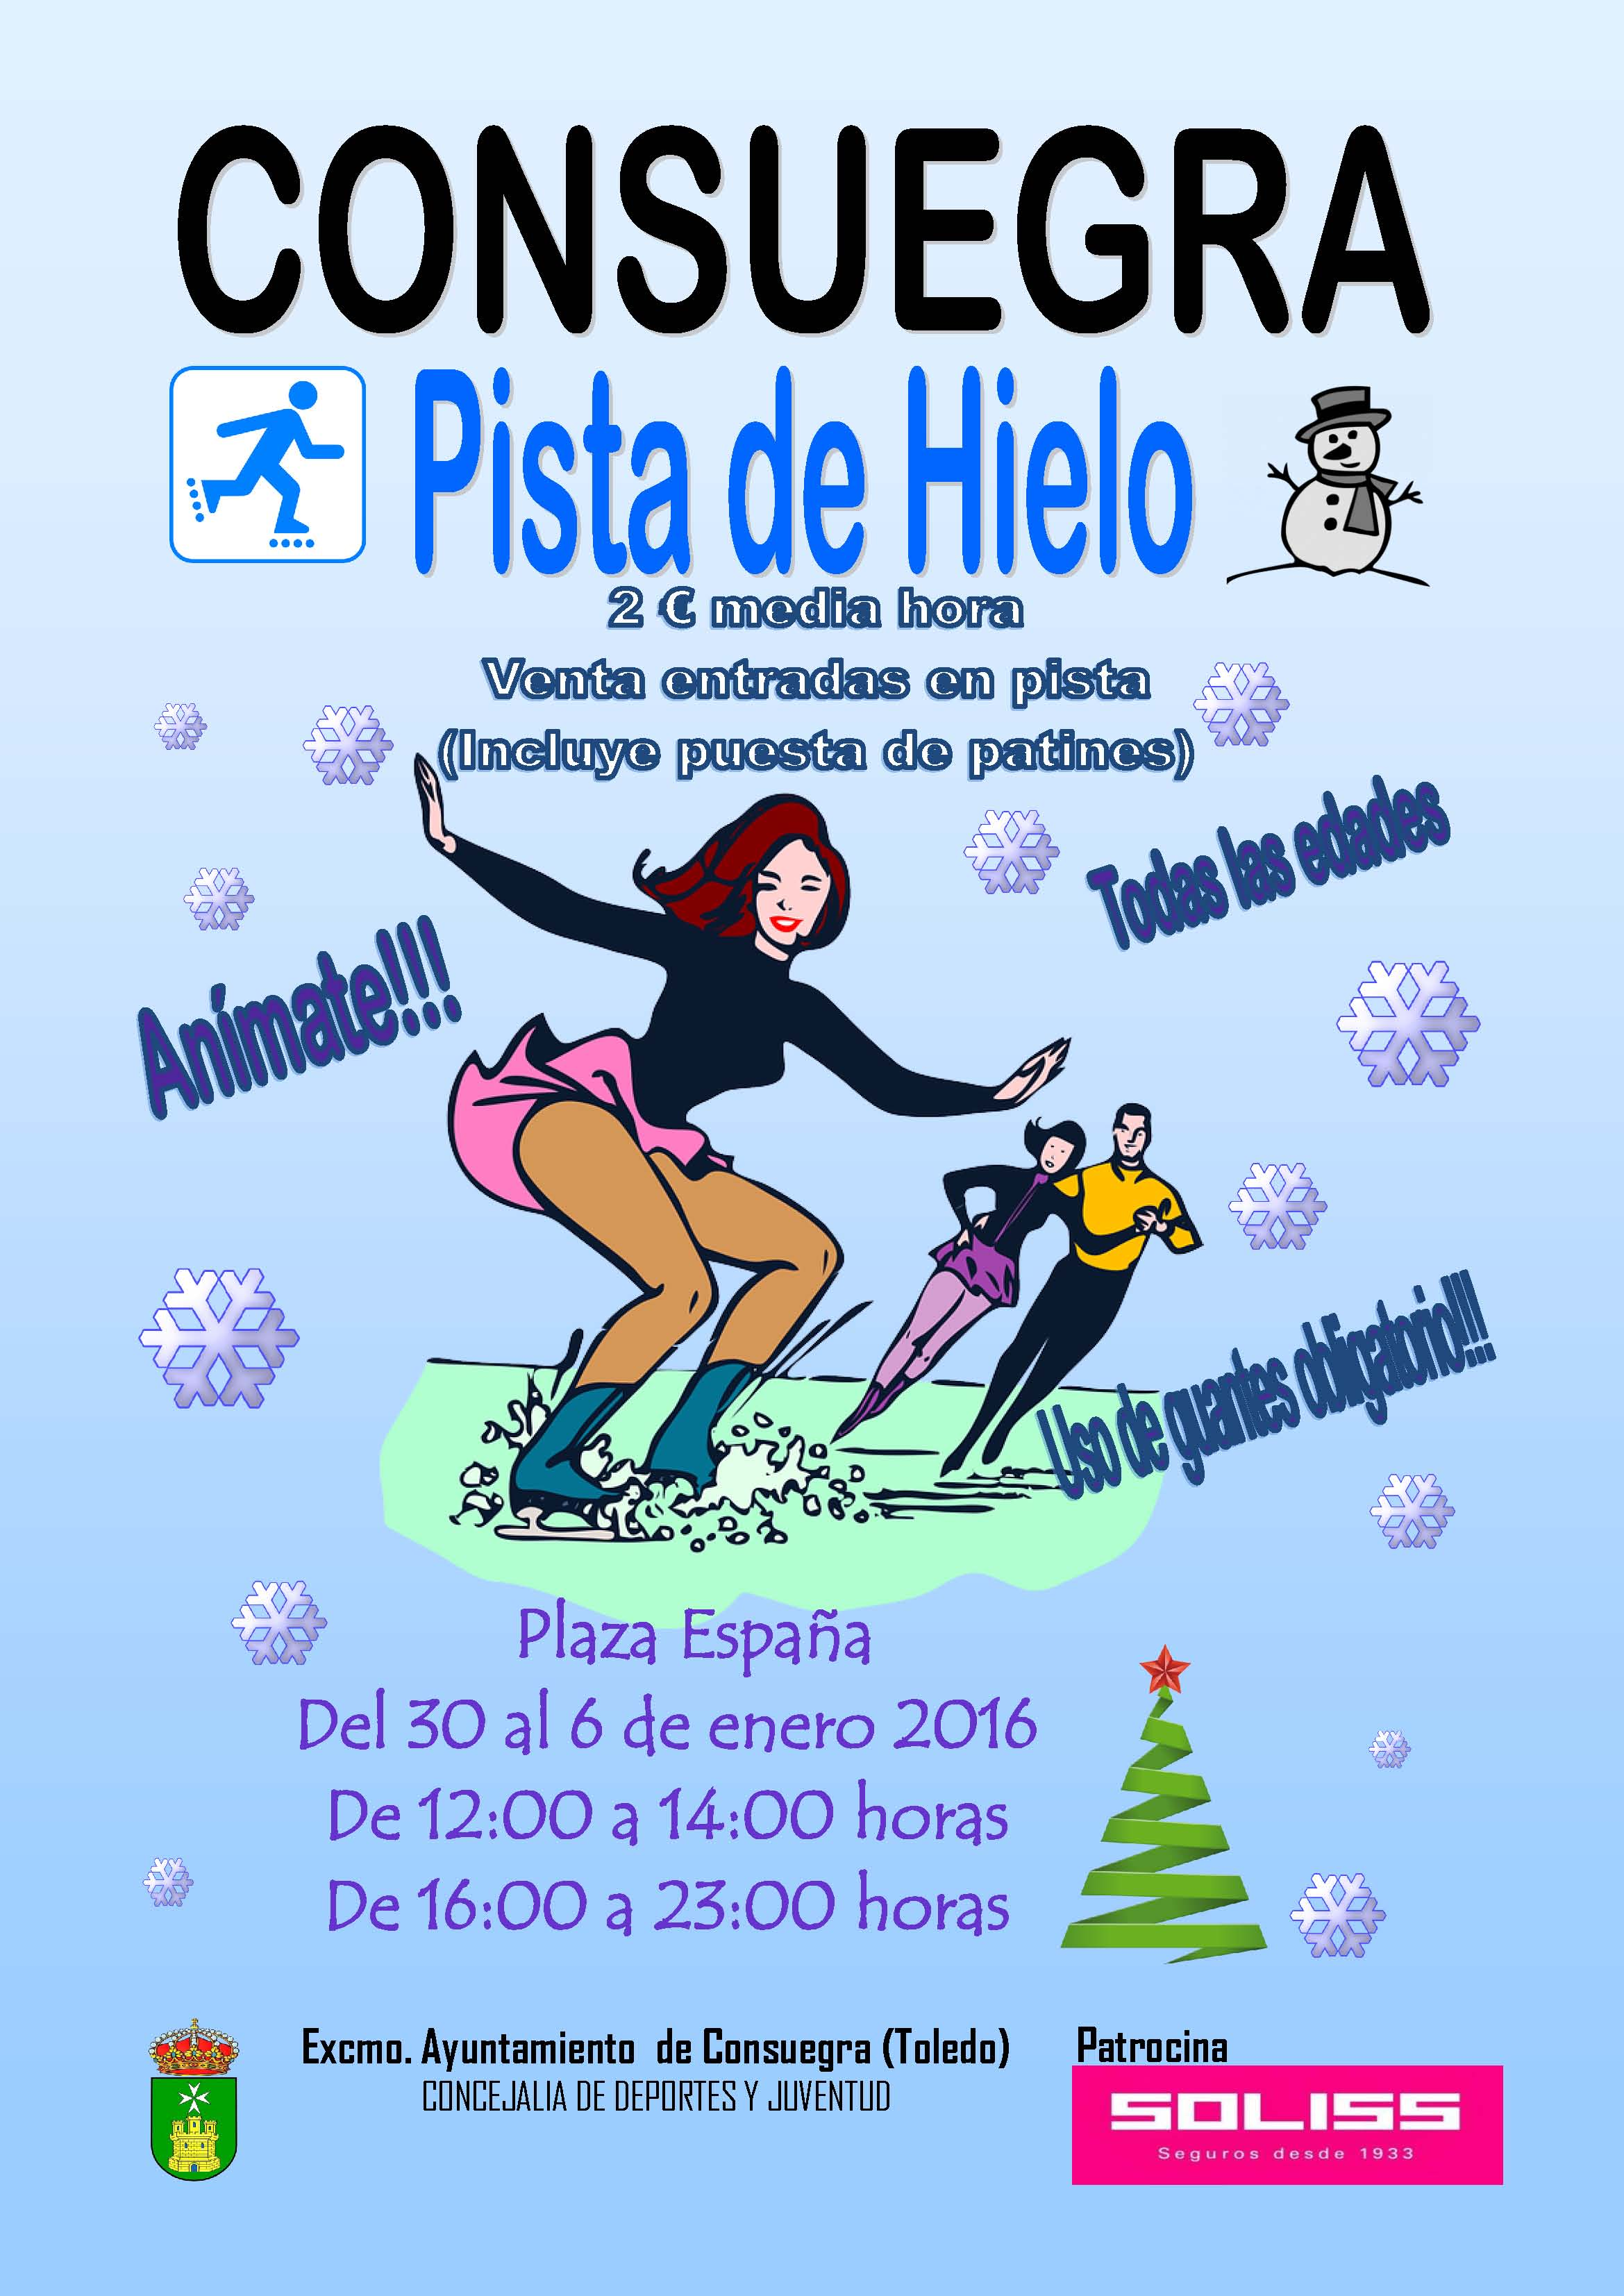 cartelA-pista-hielo-consuegra-navidad2015-16.jpg - 436.57 KB